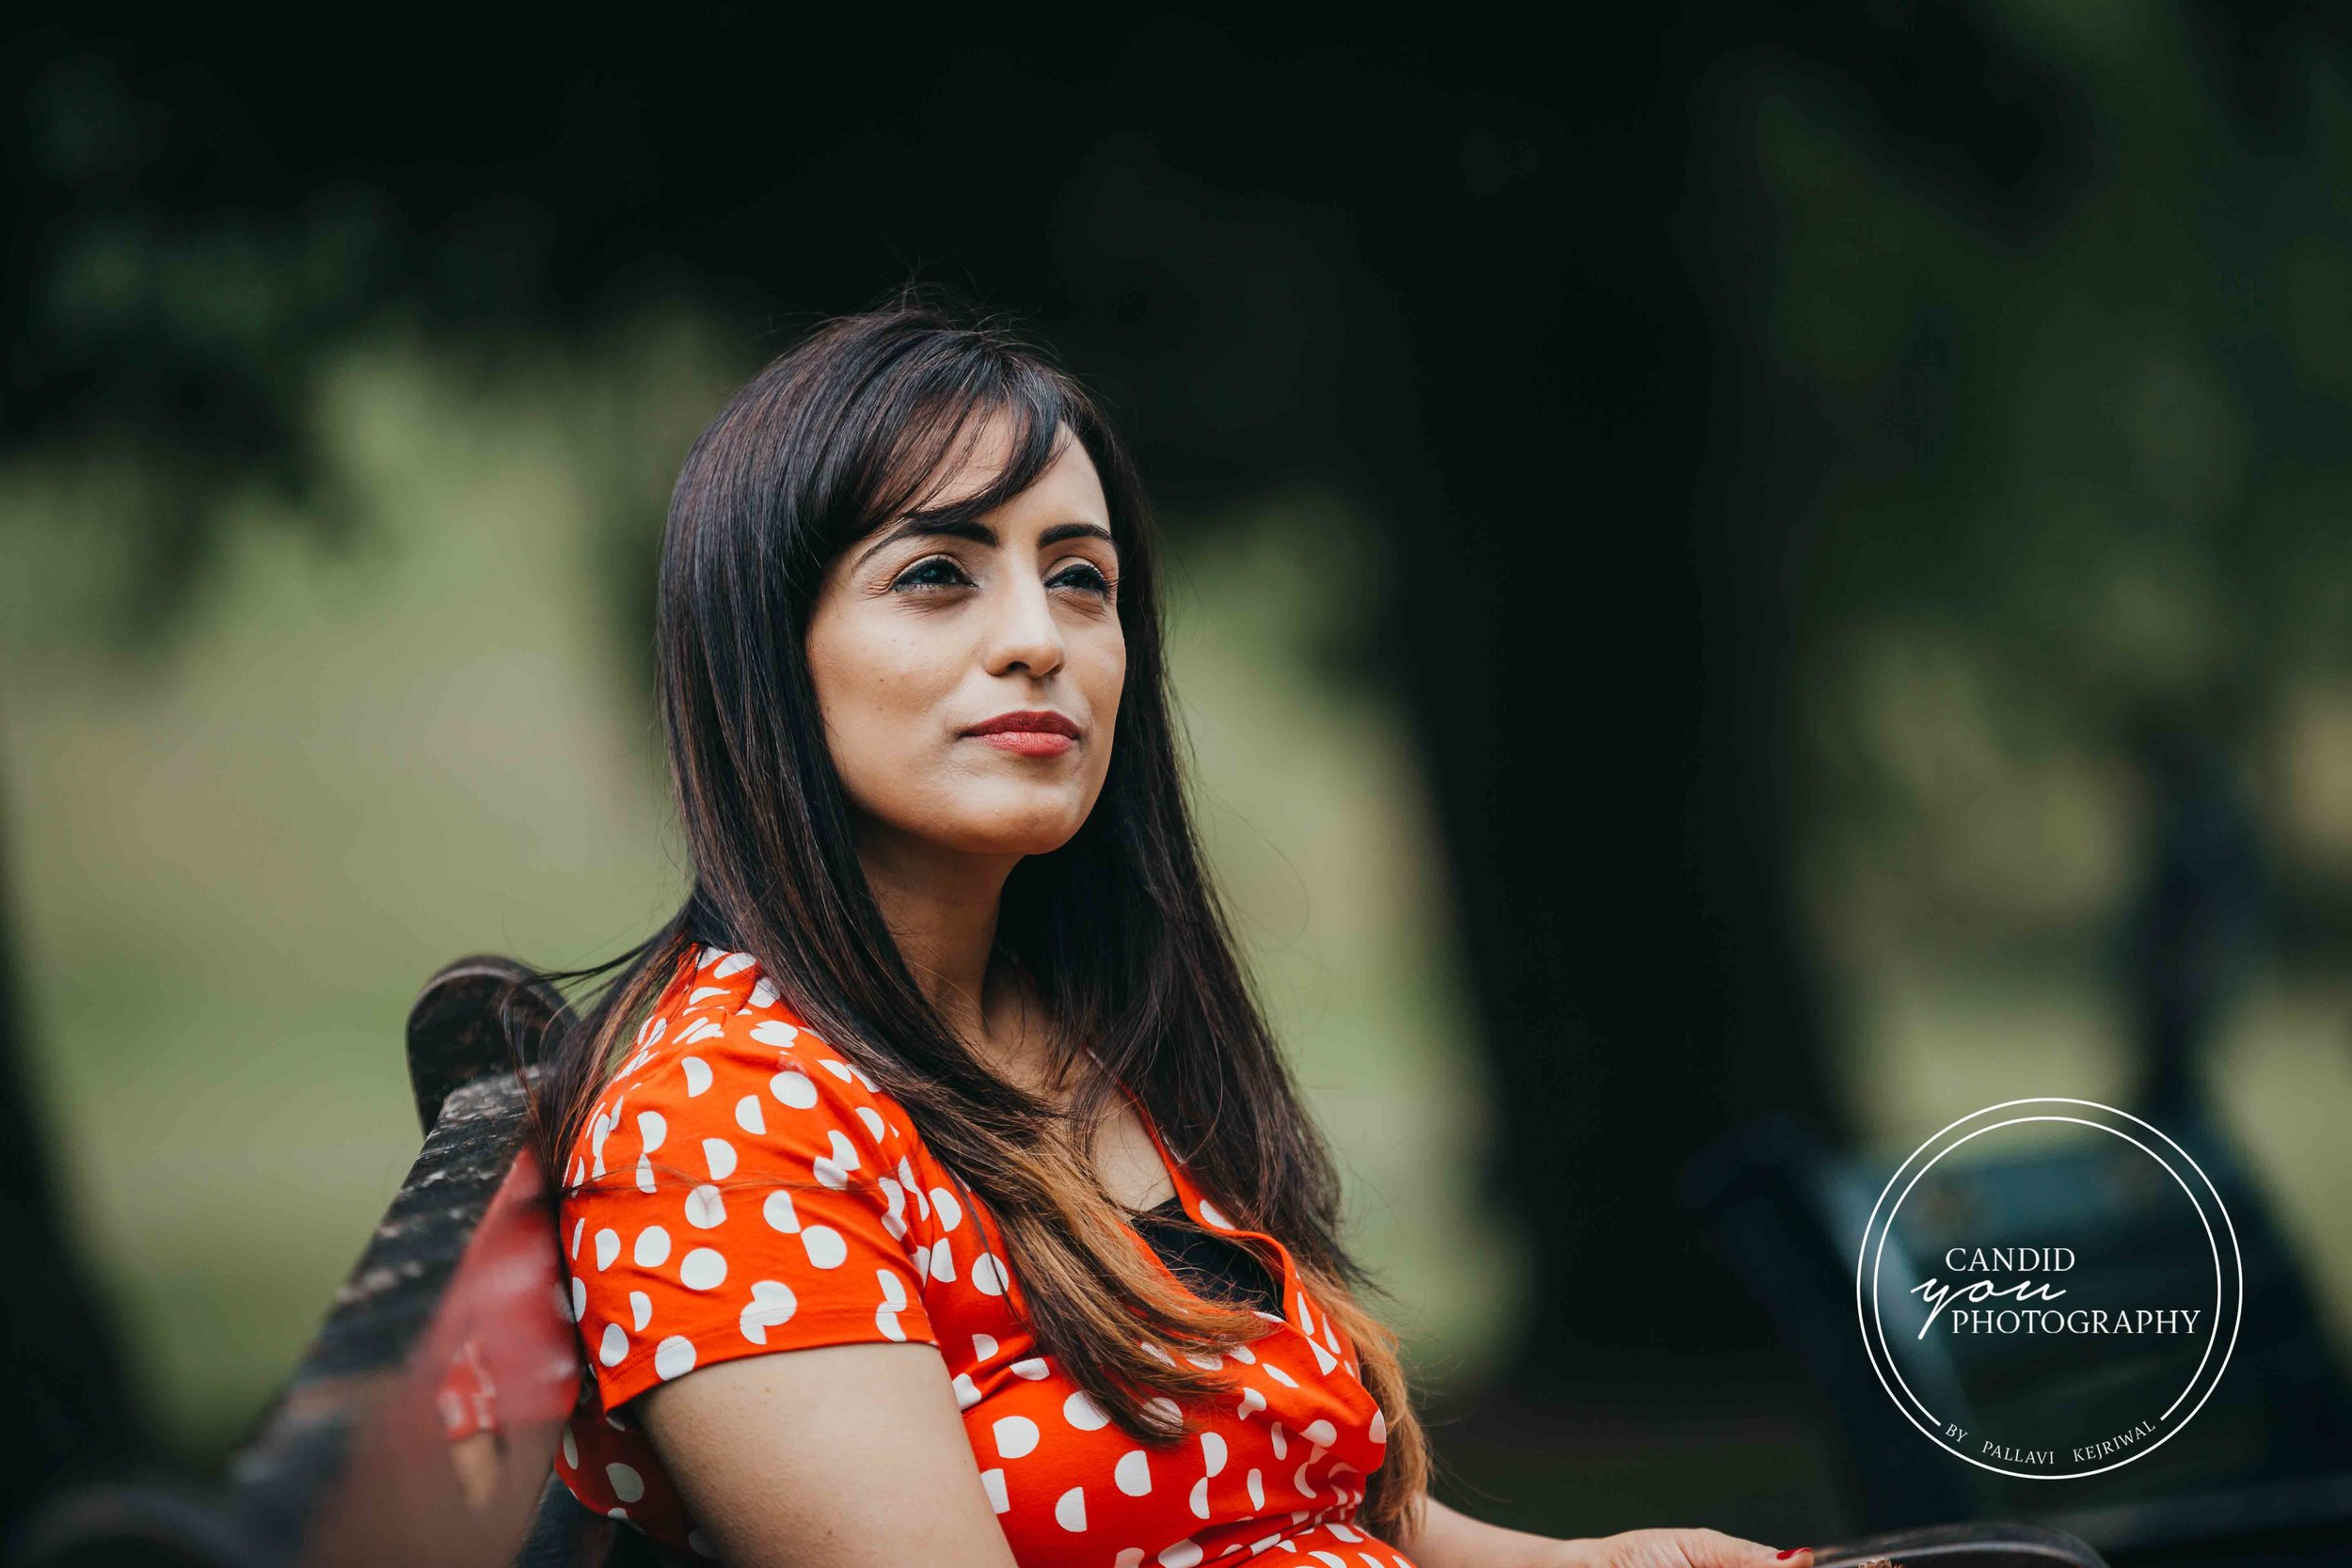 Beautiful lady sitting on park bench in orange polka dot dress